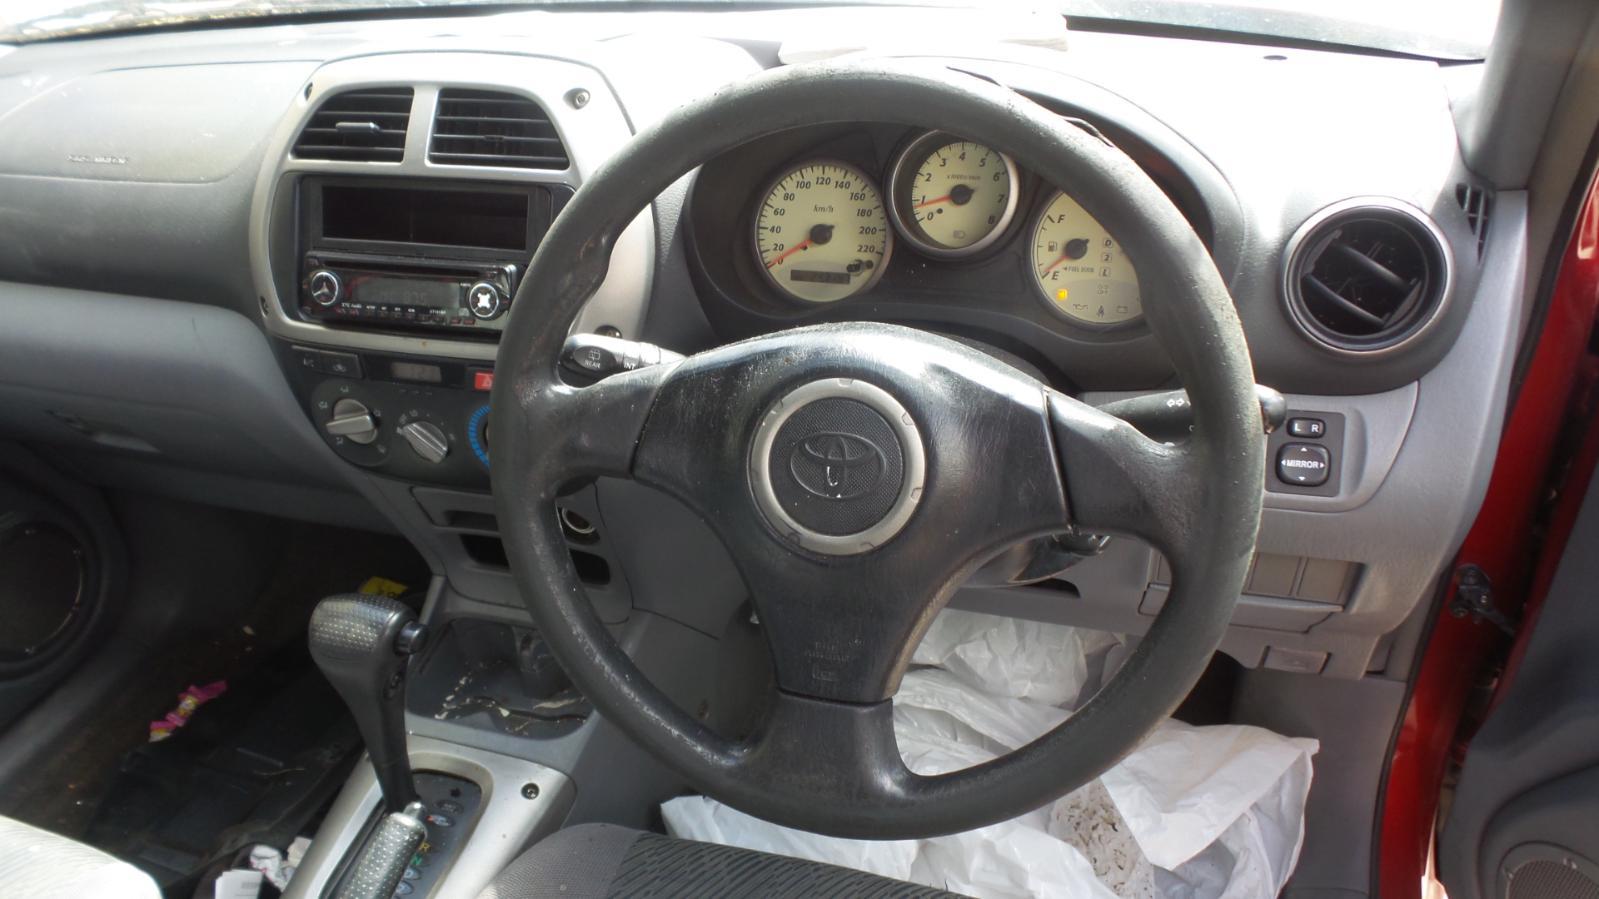 WRG-9424] Toyota Rav4 Fuse Box on